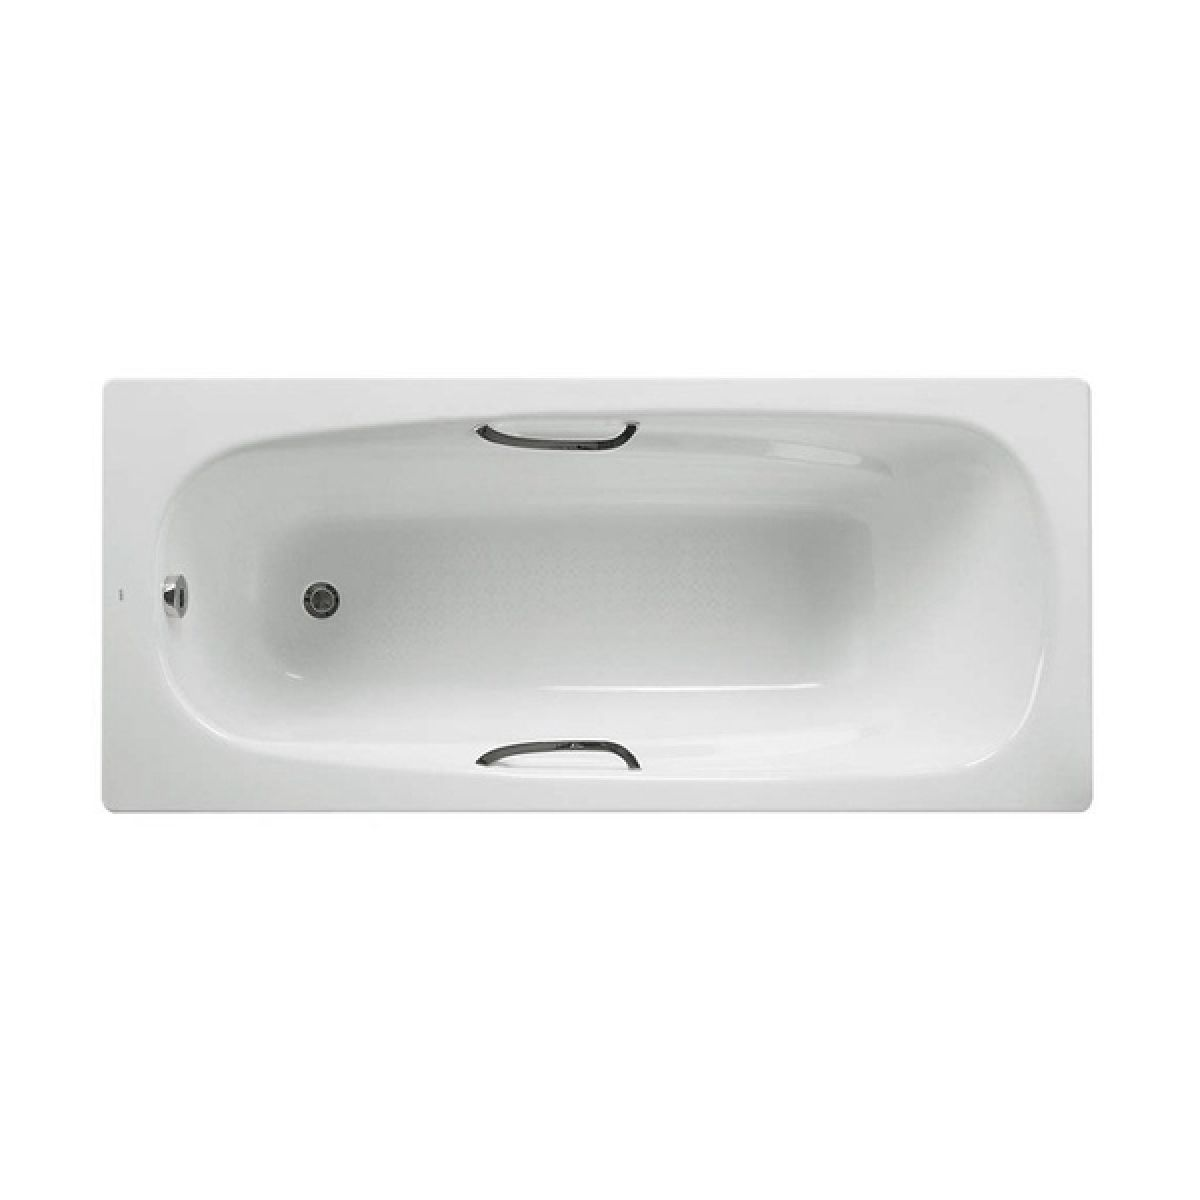 Roca Carla Steel 2 Tap Hole Bath with Grips